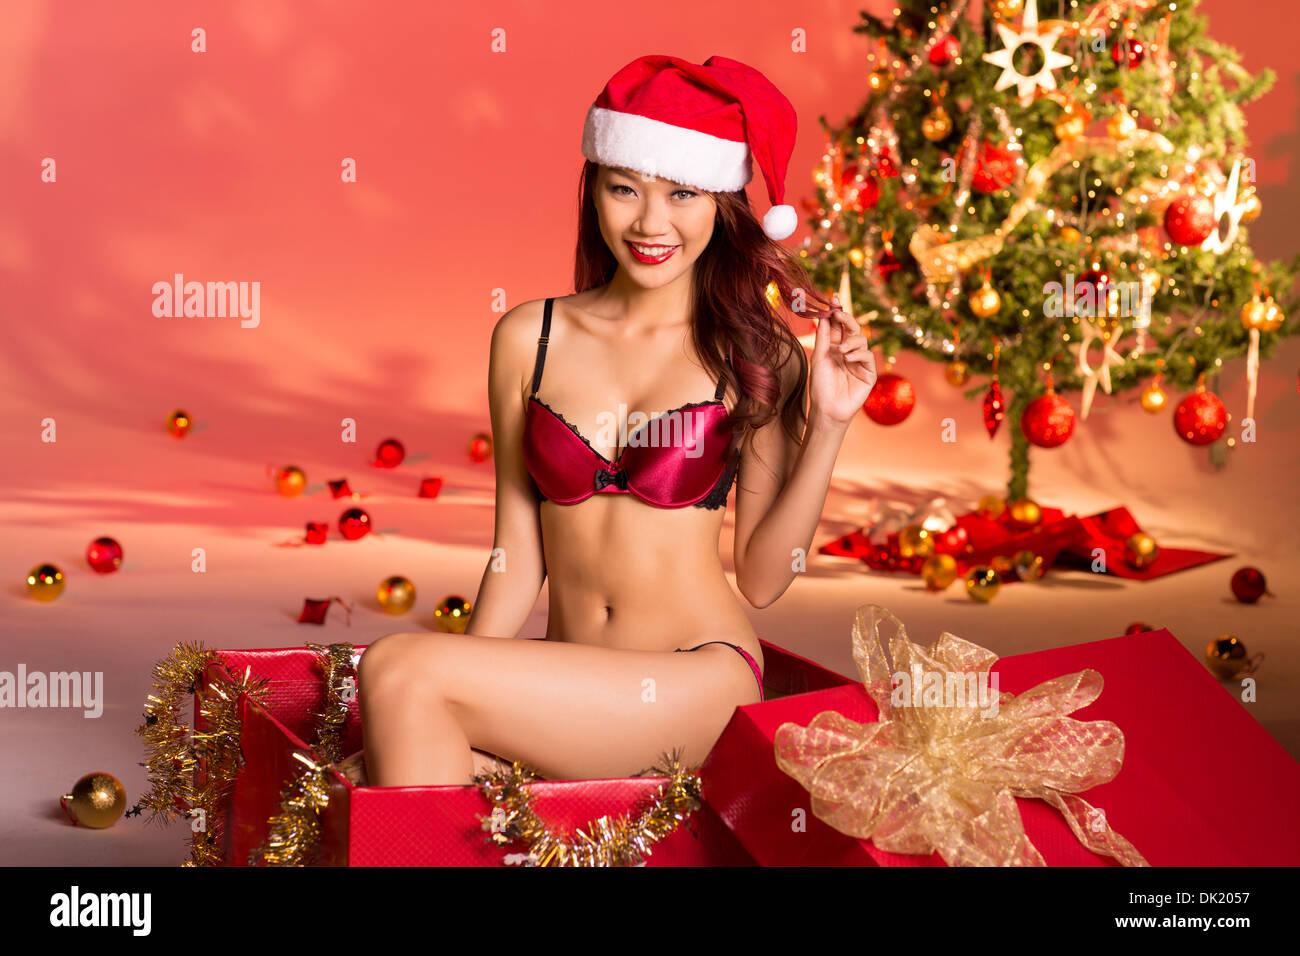 Beautiful Girl Wearing Hat Wallpaper Hermosa Chica Sexy Vestidos De Santa Claus Ropa Interior